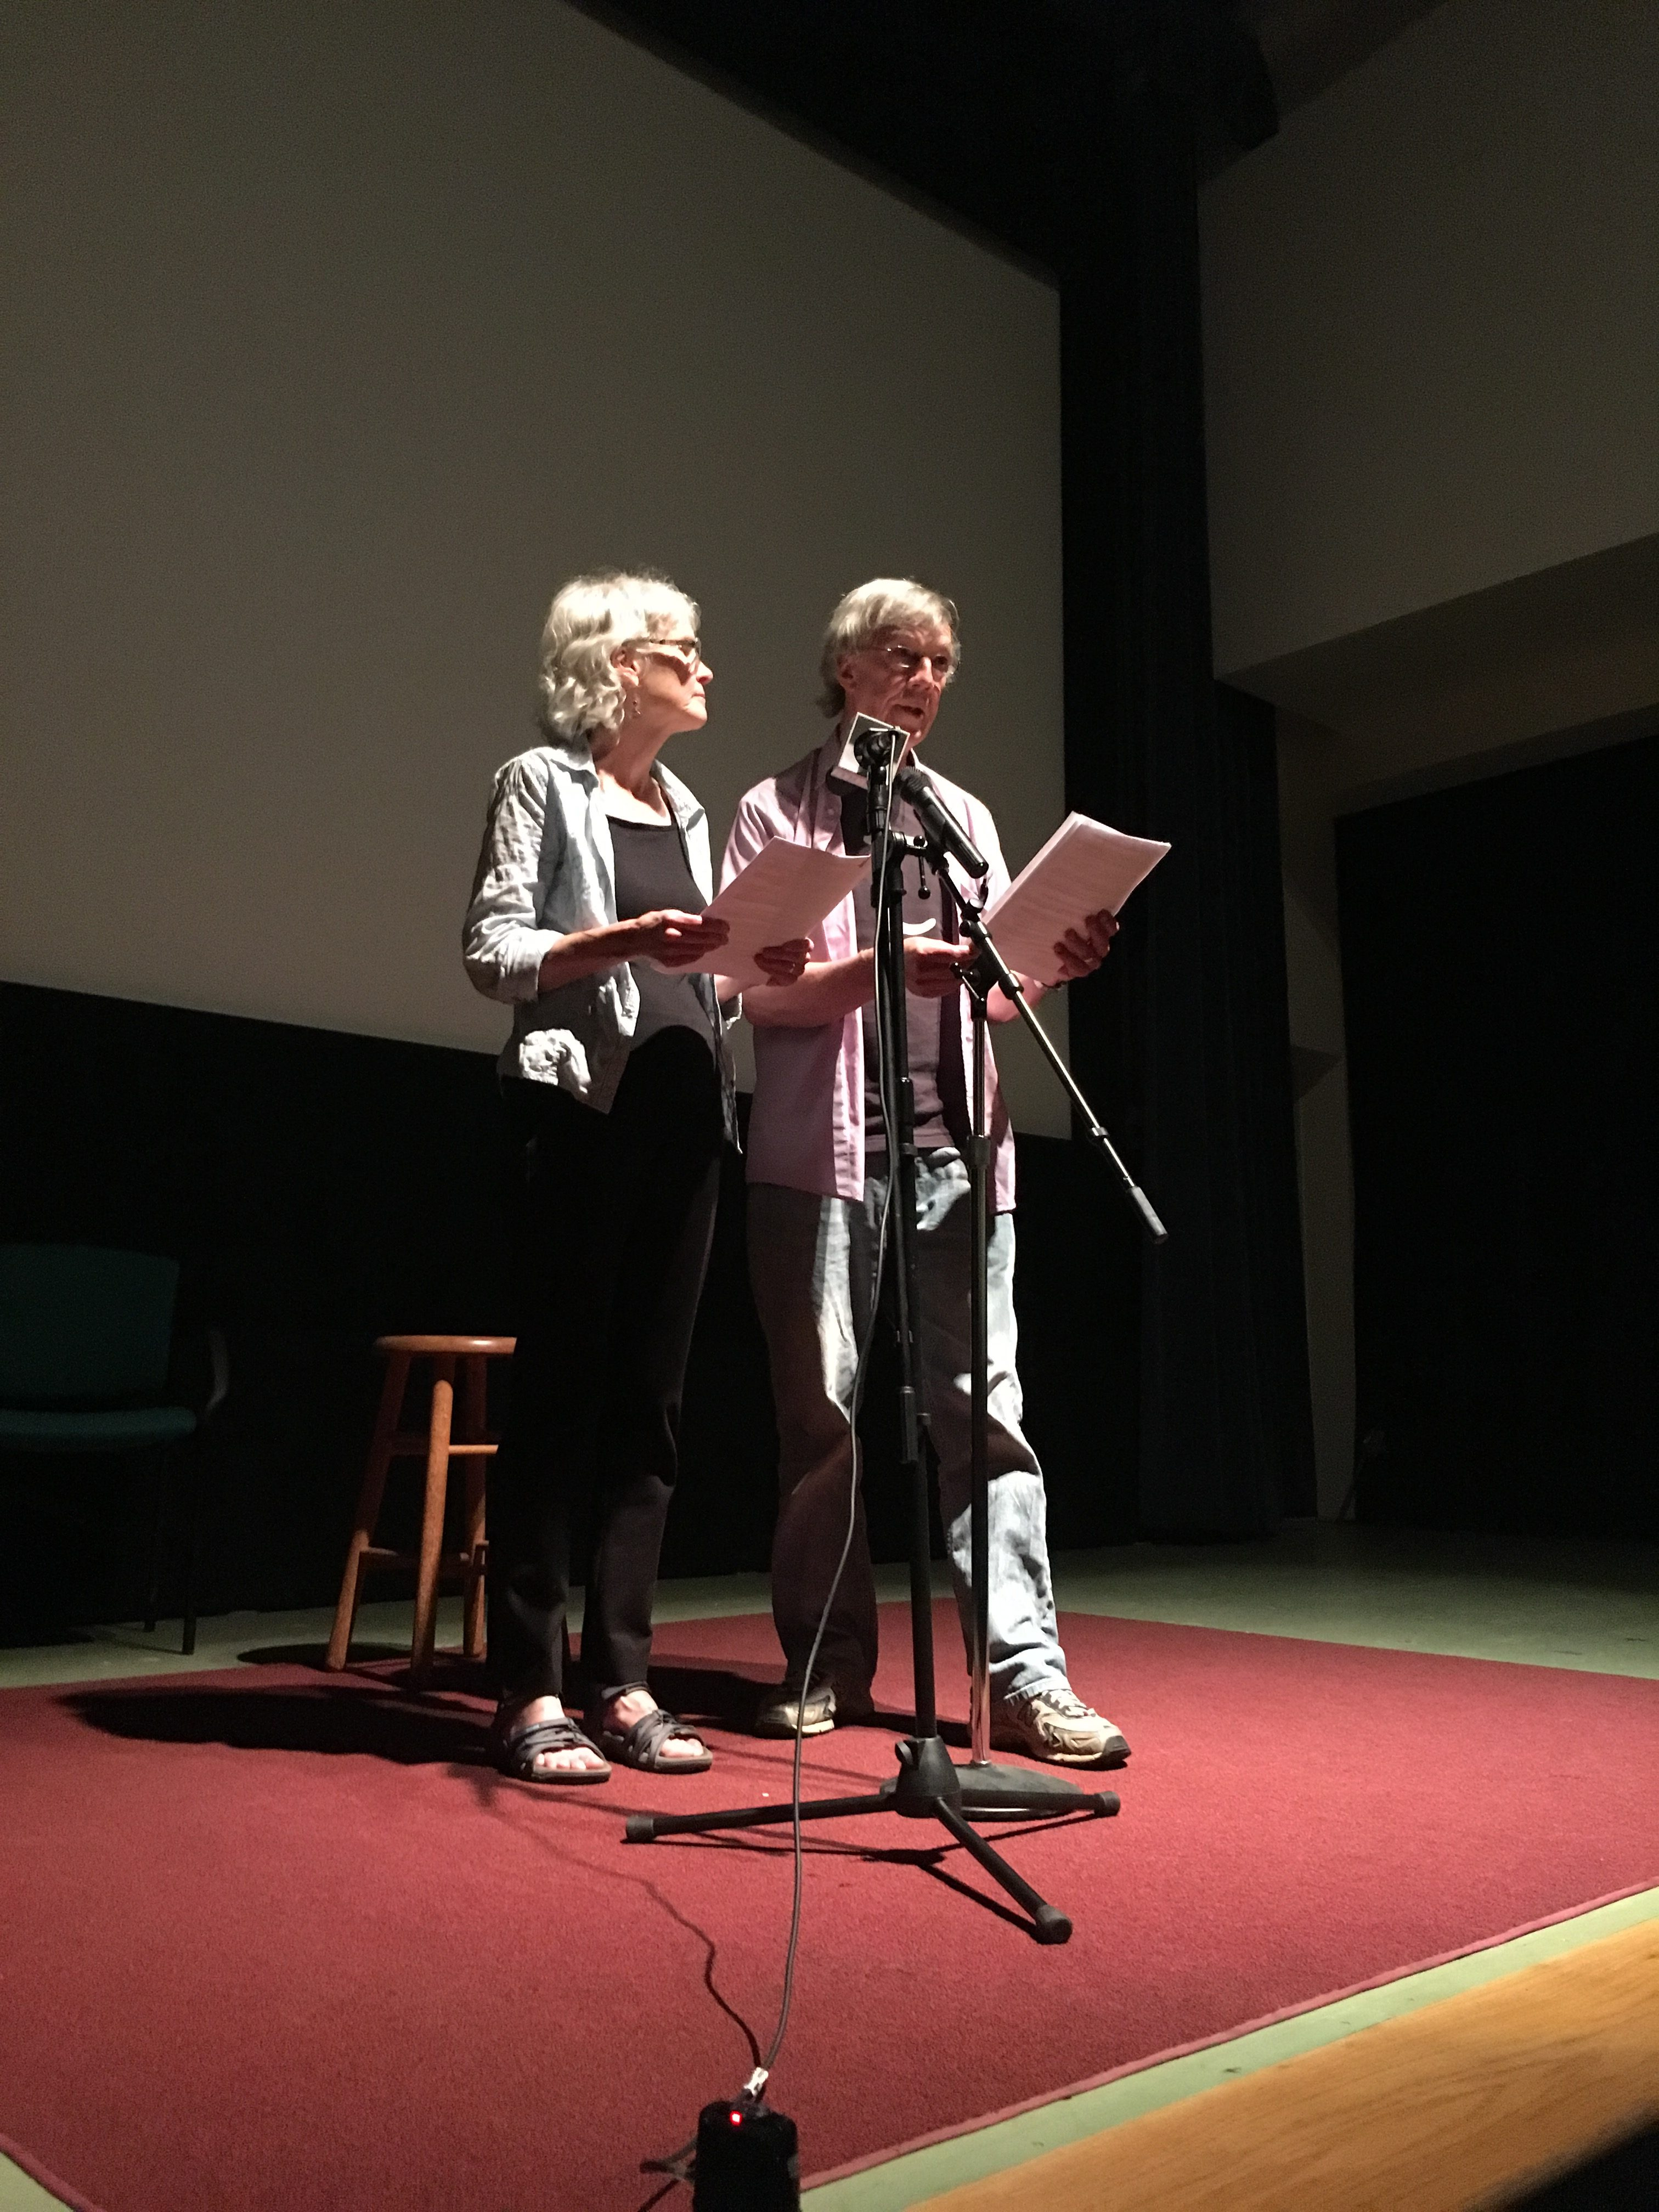 Katie and John Greenman